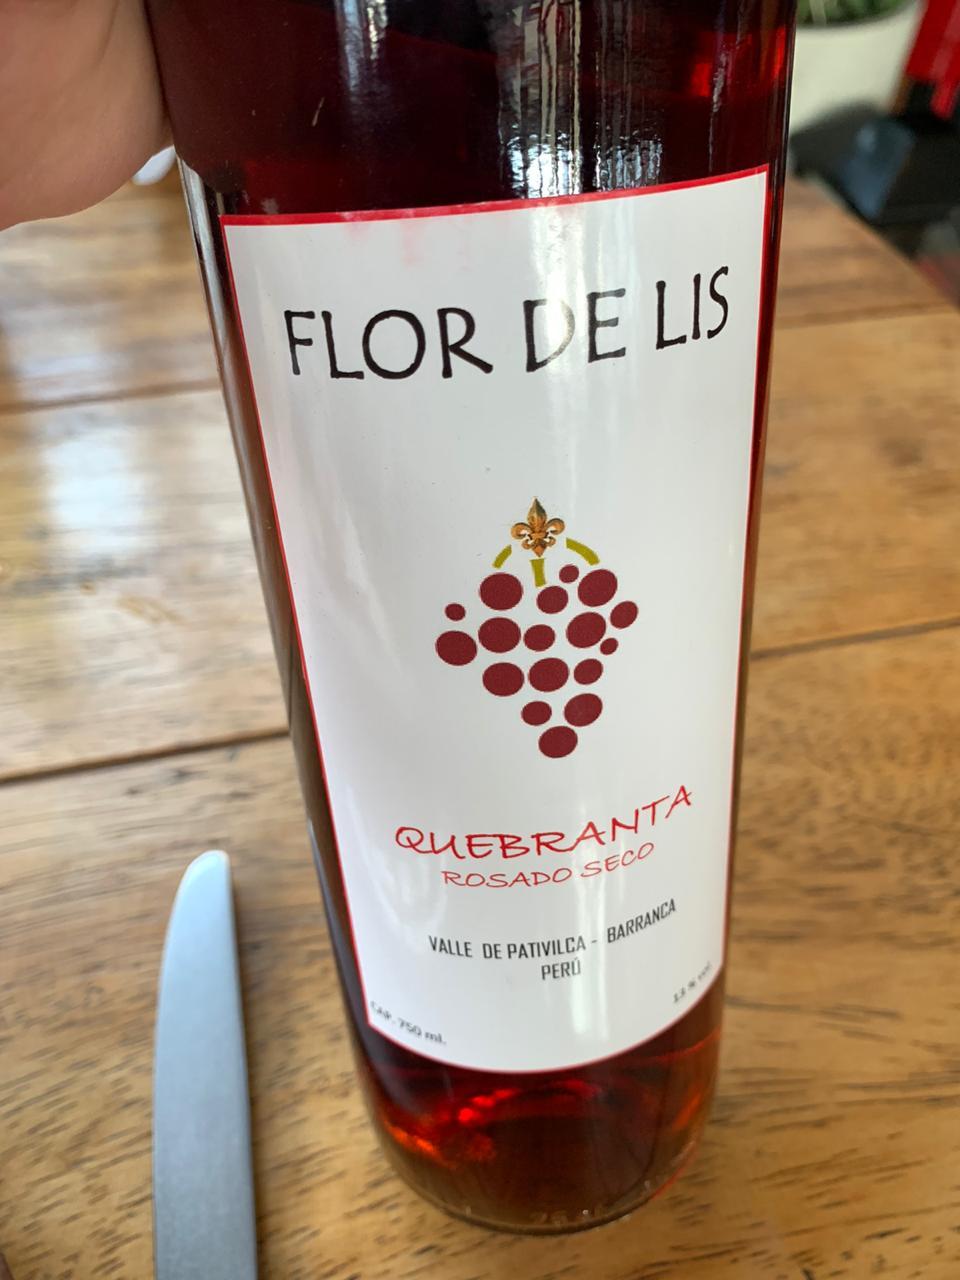 Vino Flor de Lis – Rosado Seco Quebranta